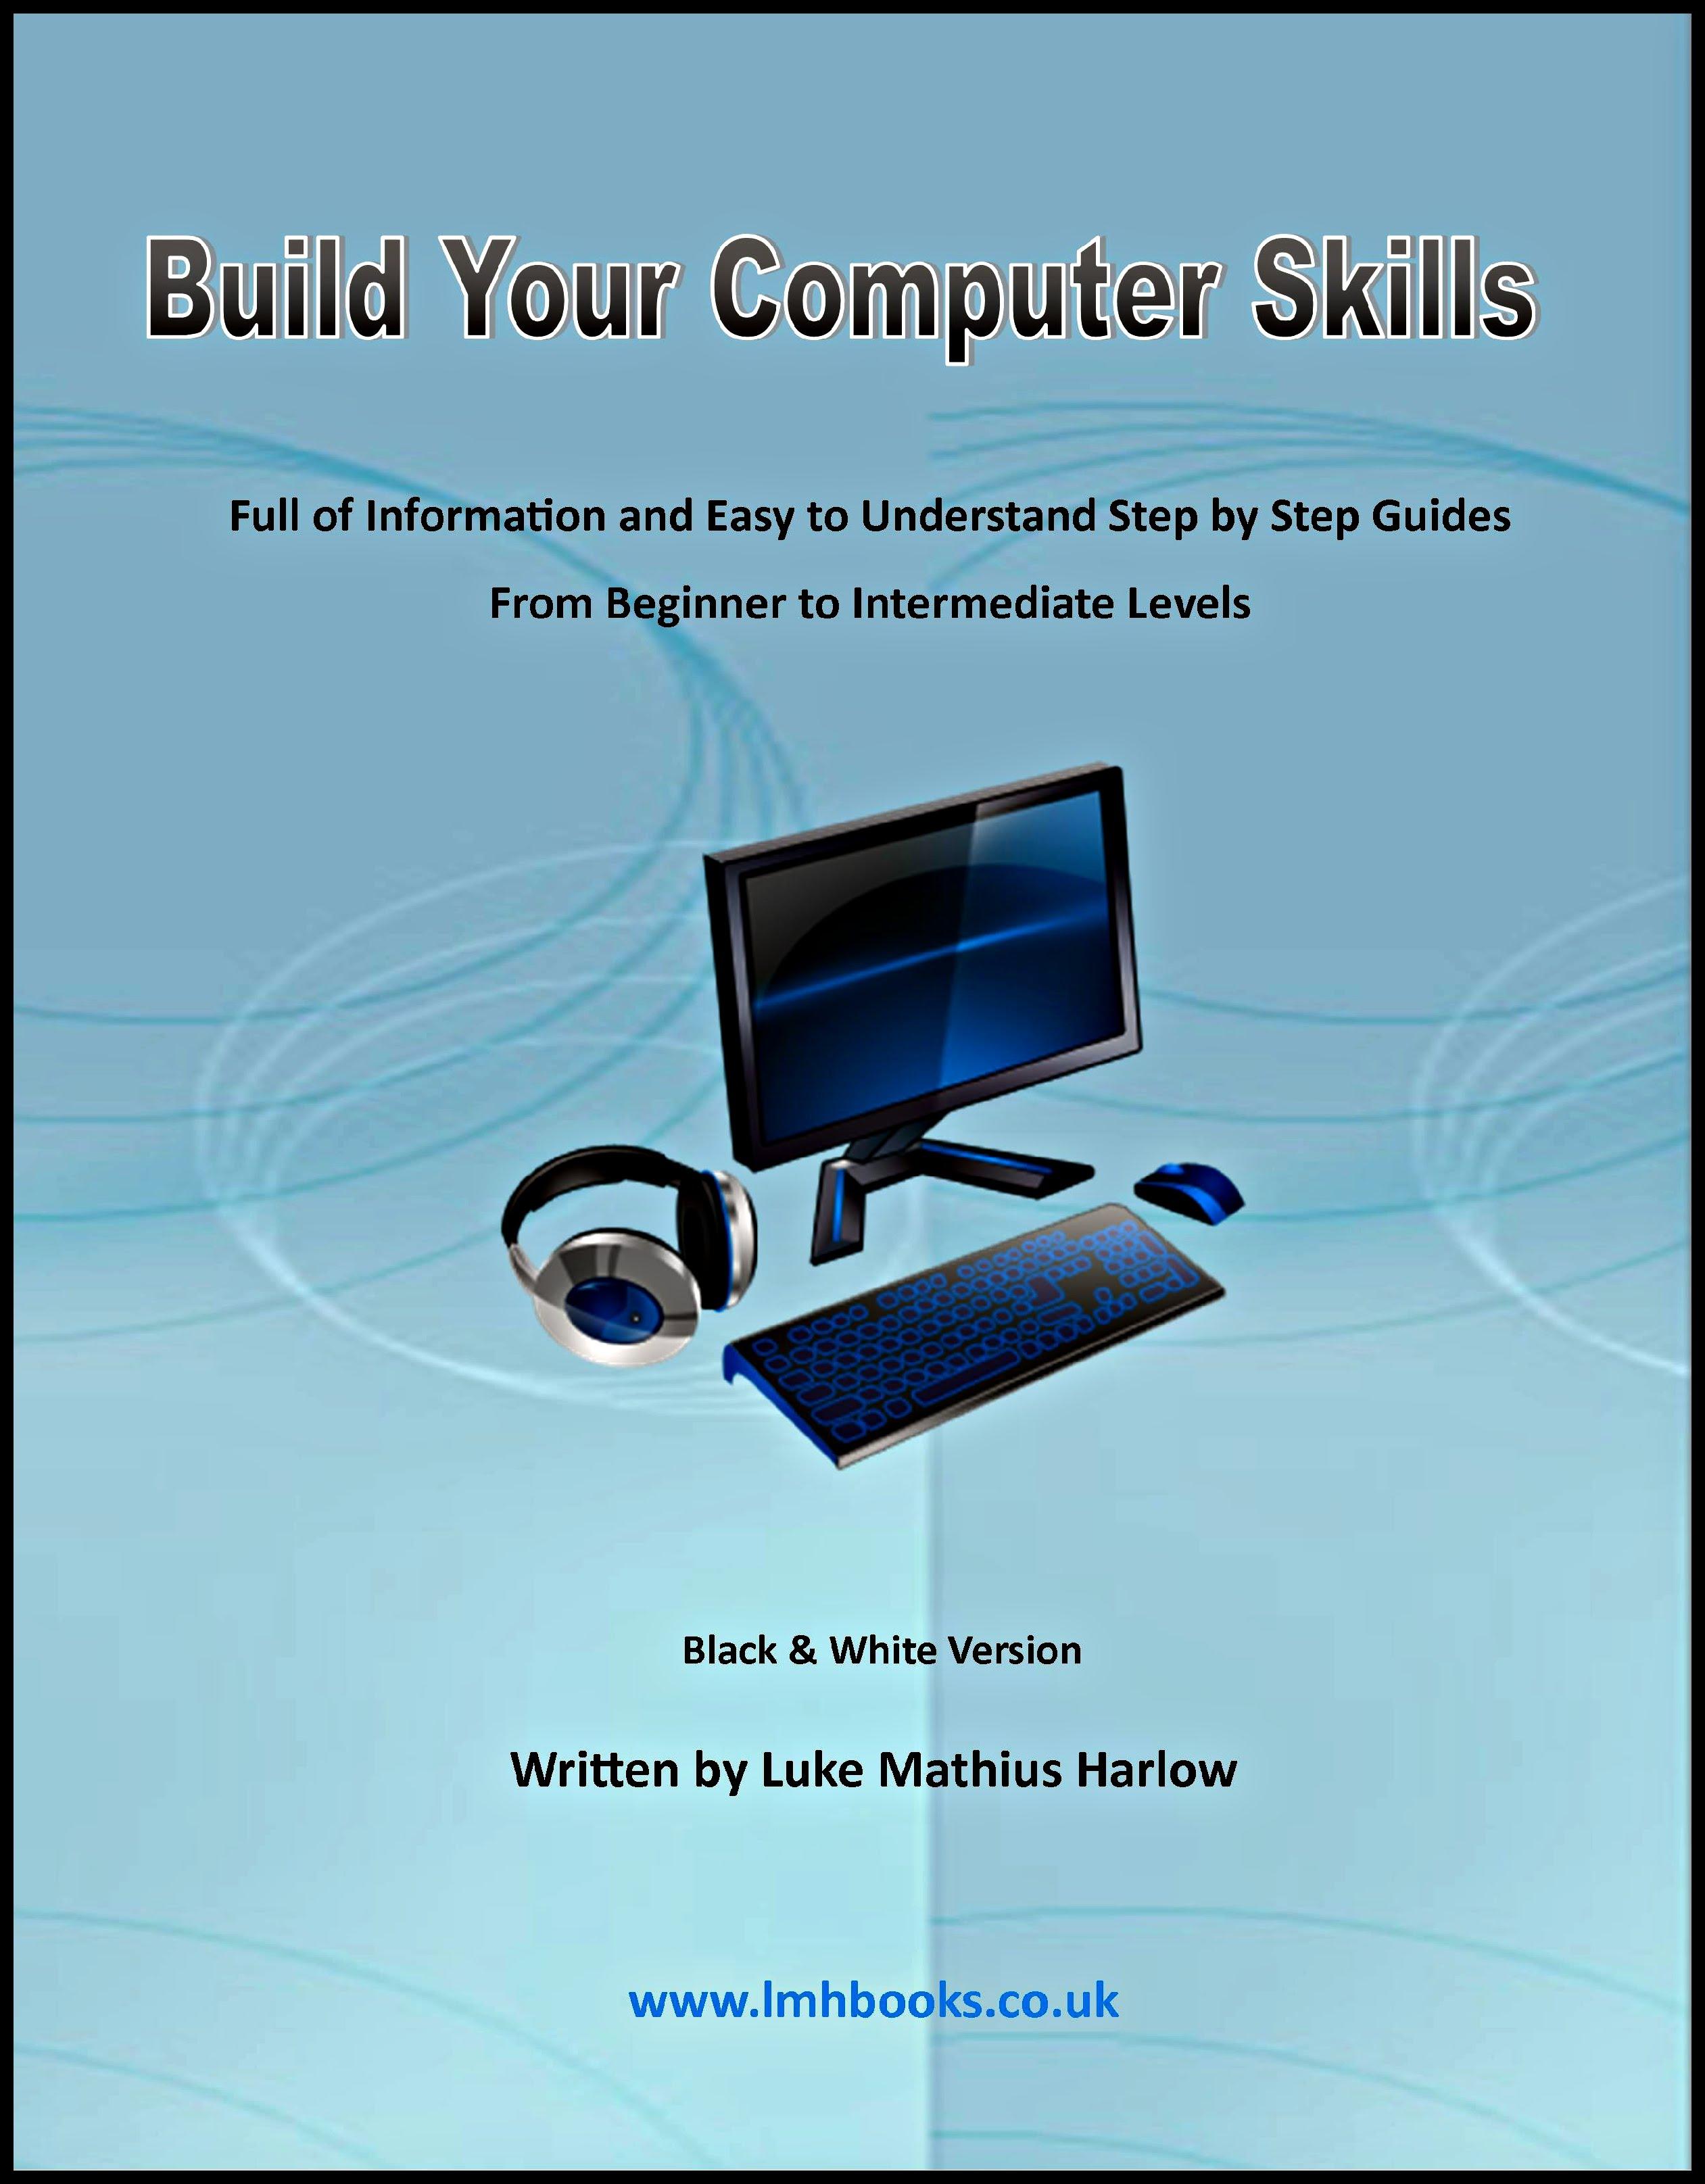 http://www.amazon.co.uk/Build-Computer-Skills-Mathius-Harlow/dp/1505370531/ref=sr_1_1?s=books&ie=UTF8&qid=1436902451&sr=1-1&keywords=luke+mathius+harlow